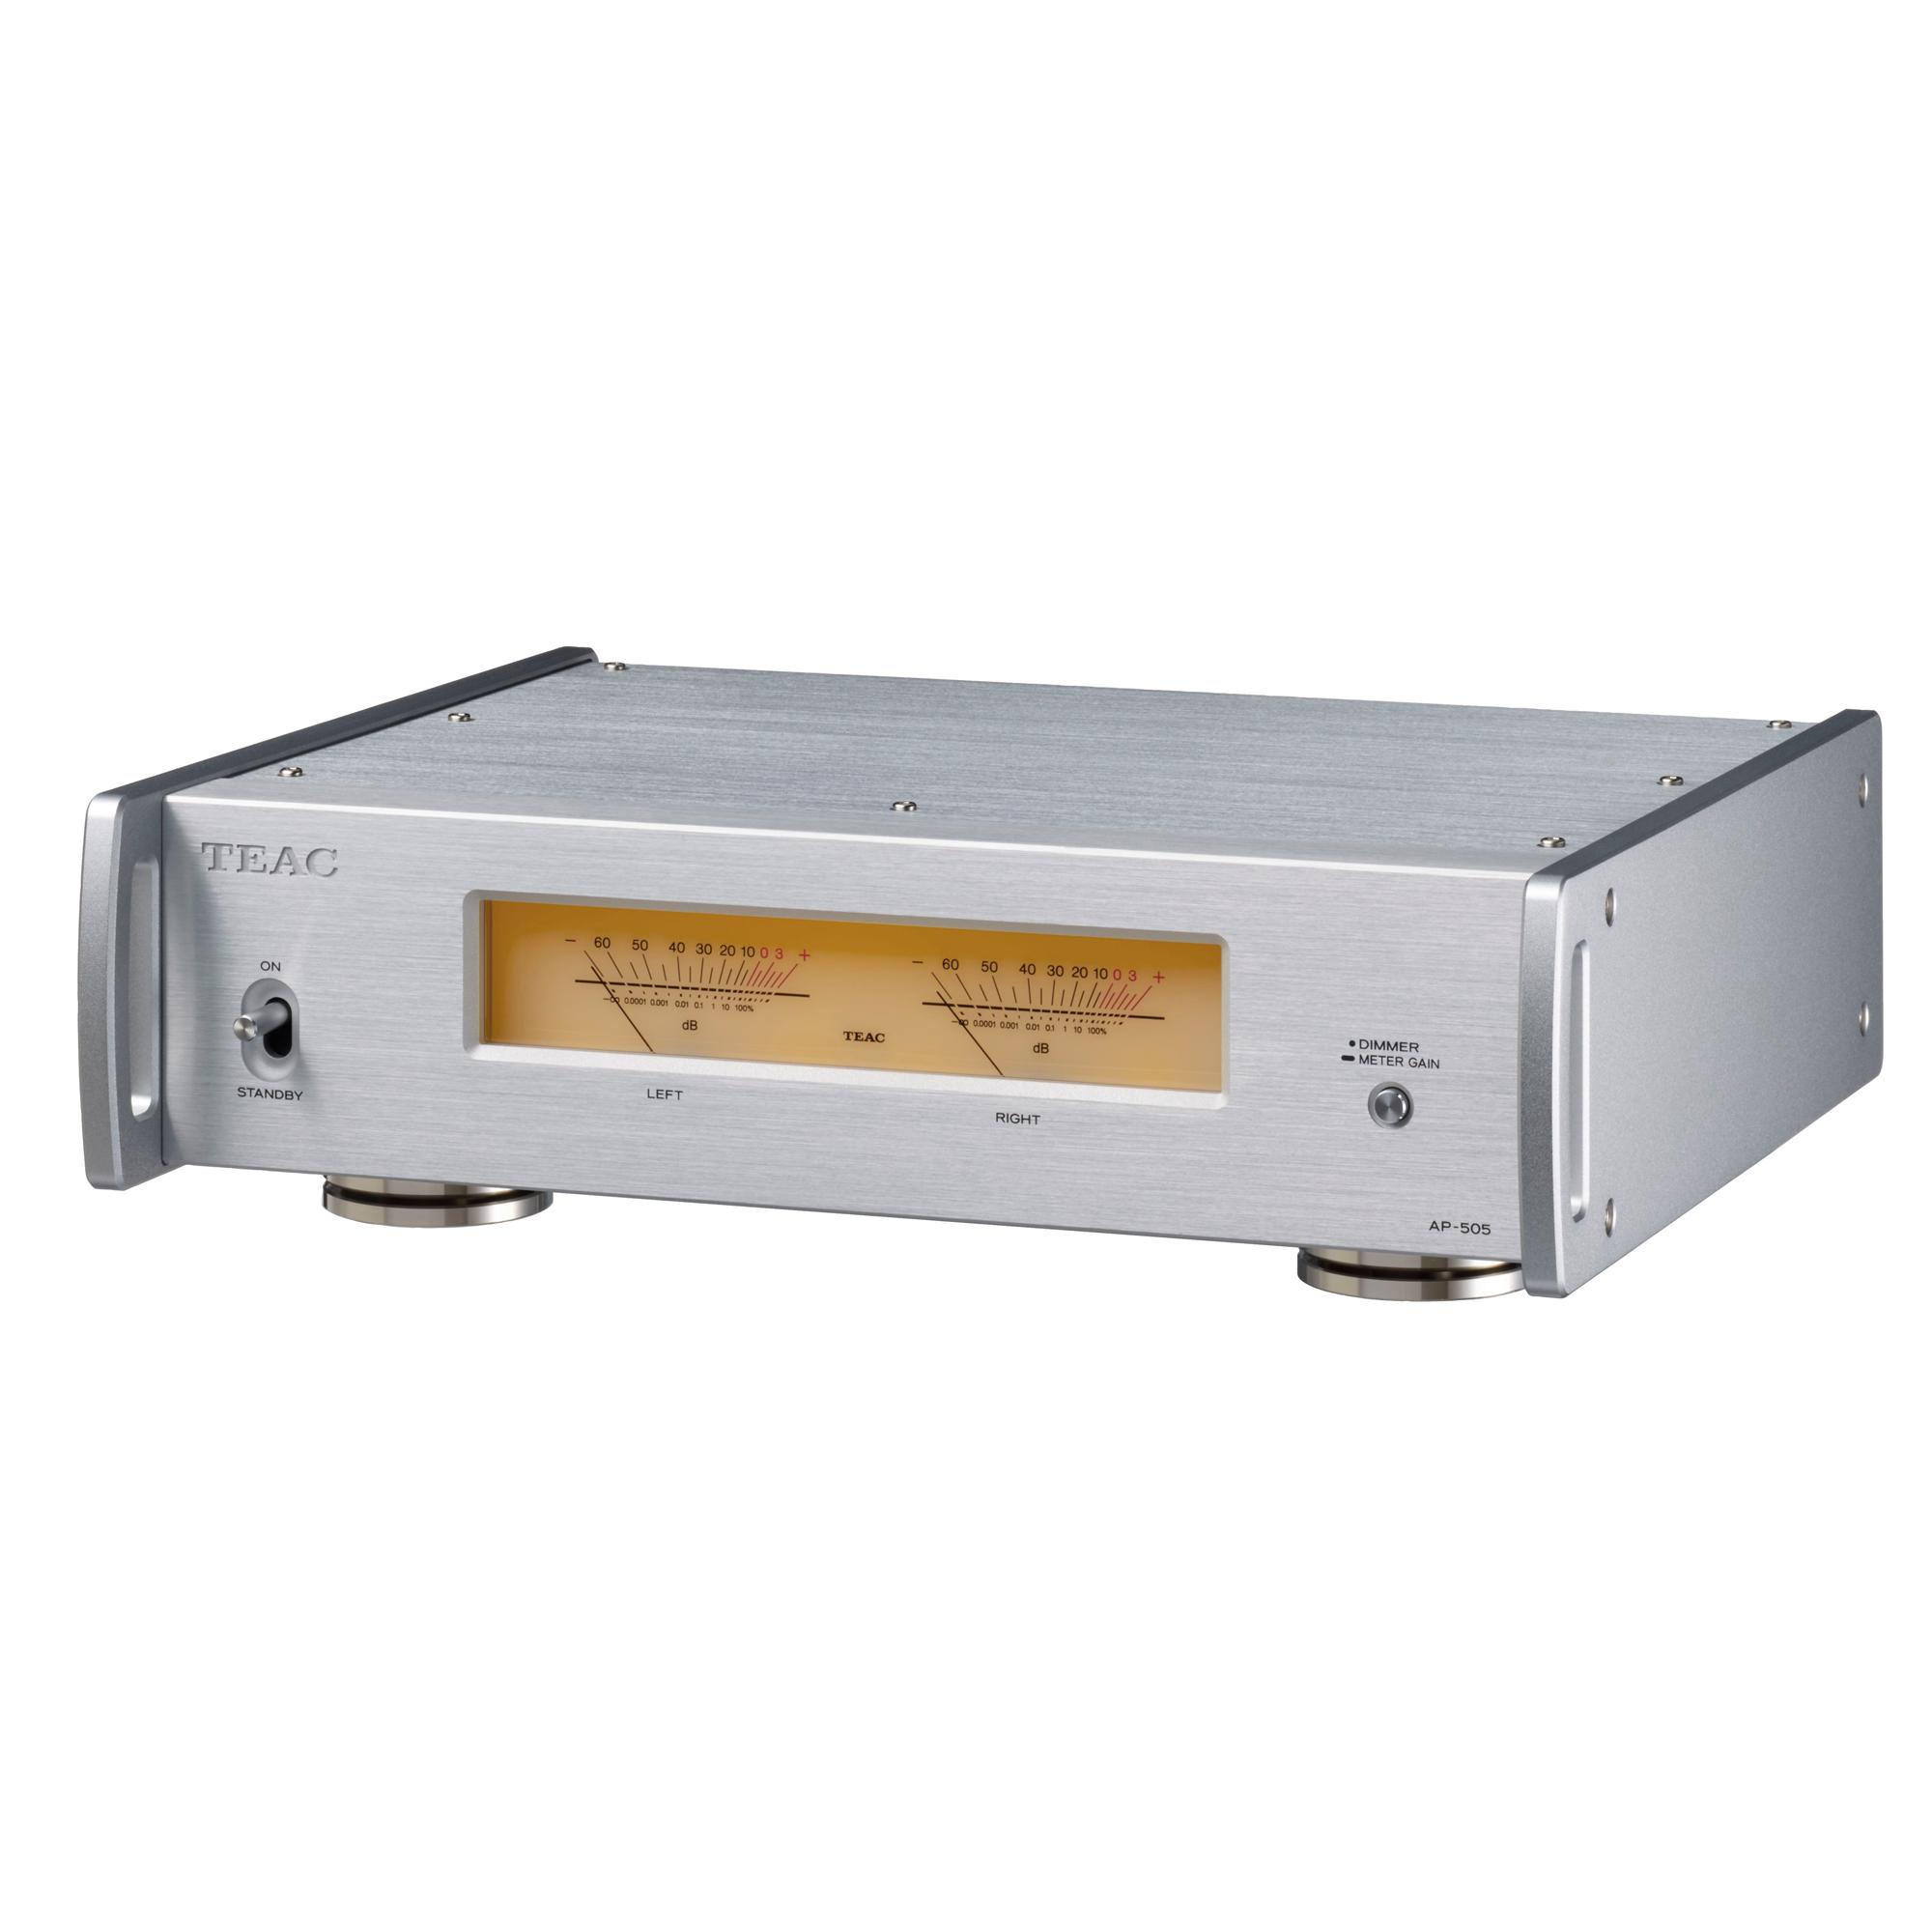 Teac AP-505 silber Stereo-Endverstärker 101133